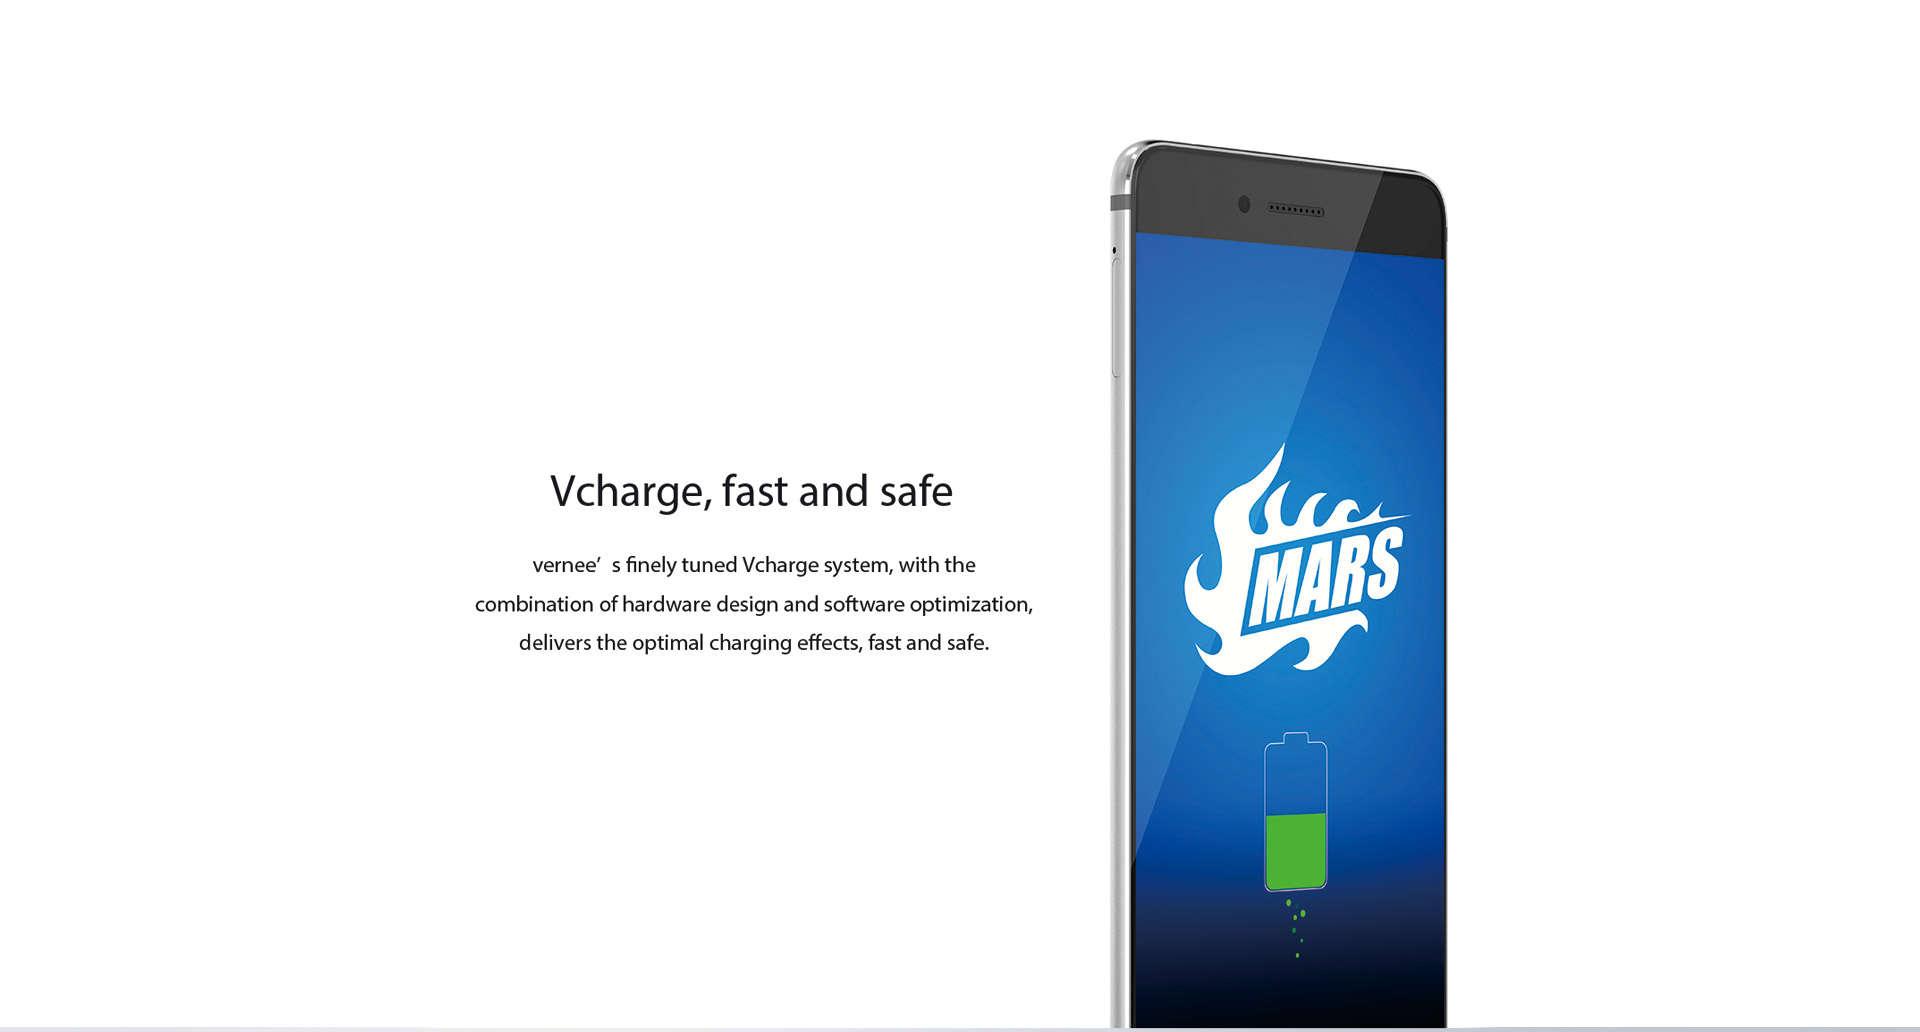 vernee-marsh-4g-phablet-fast-charging